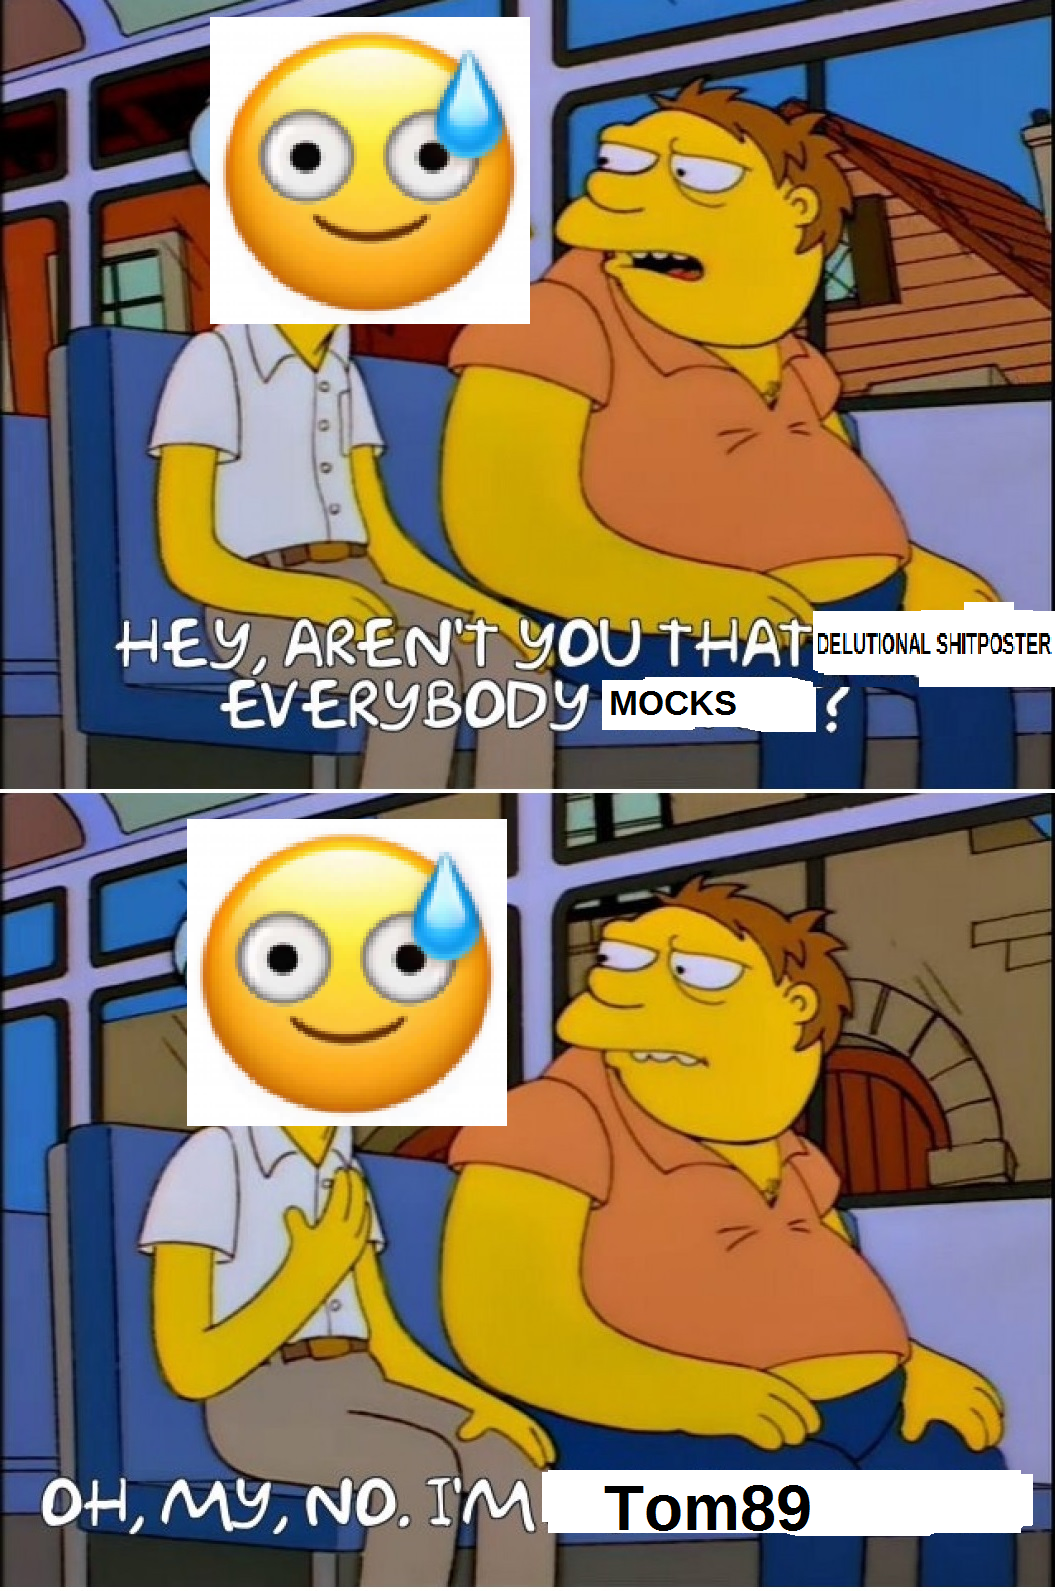 SimpsTom posting